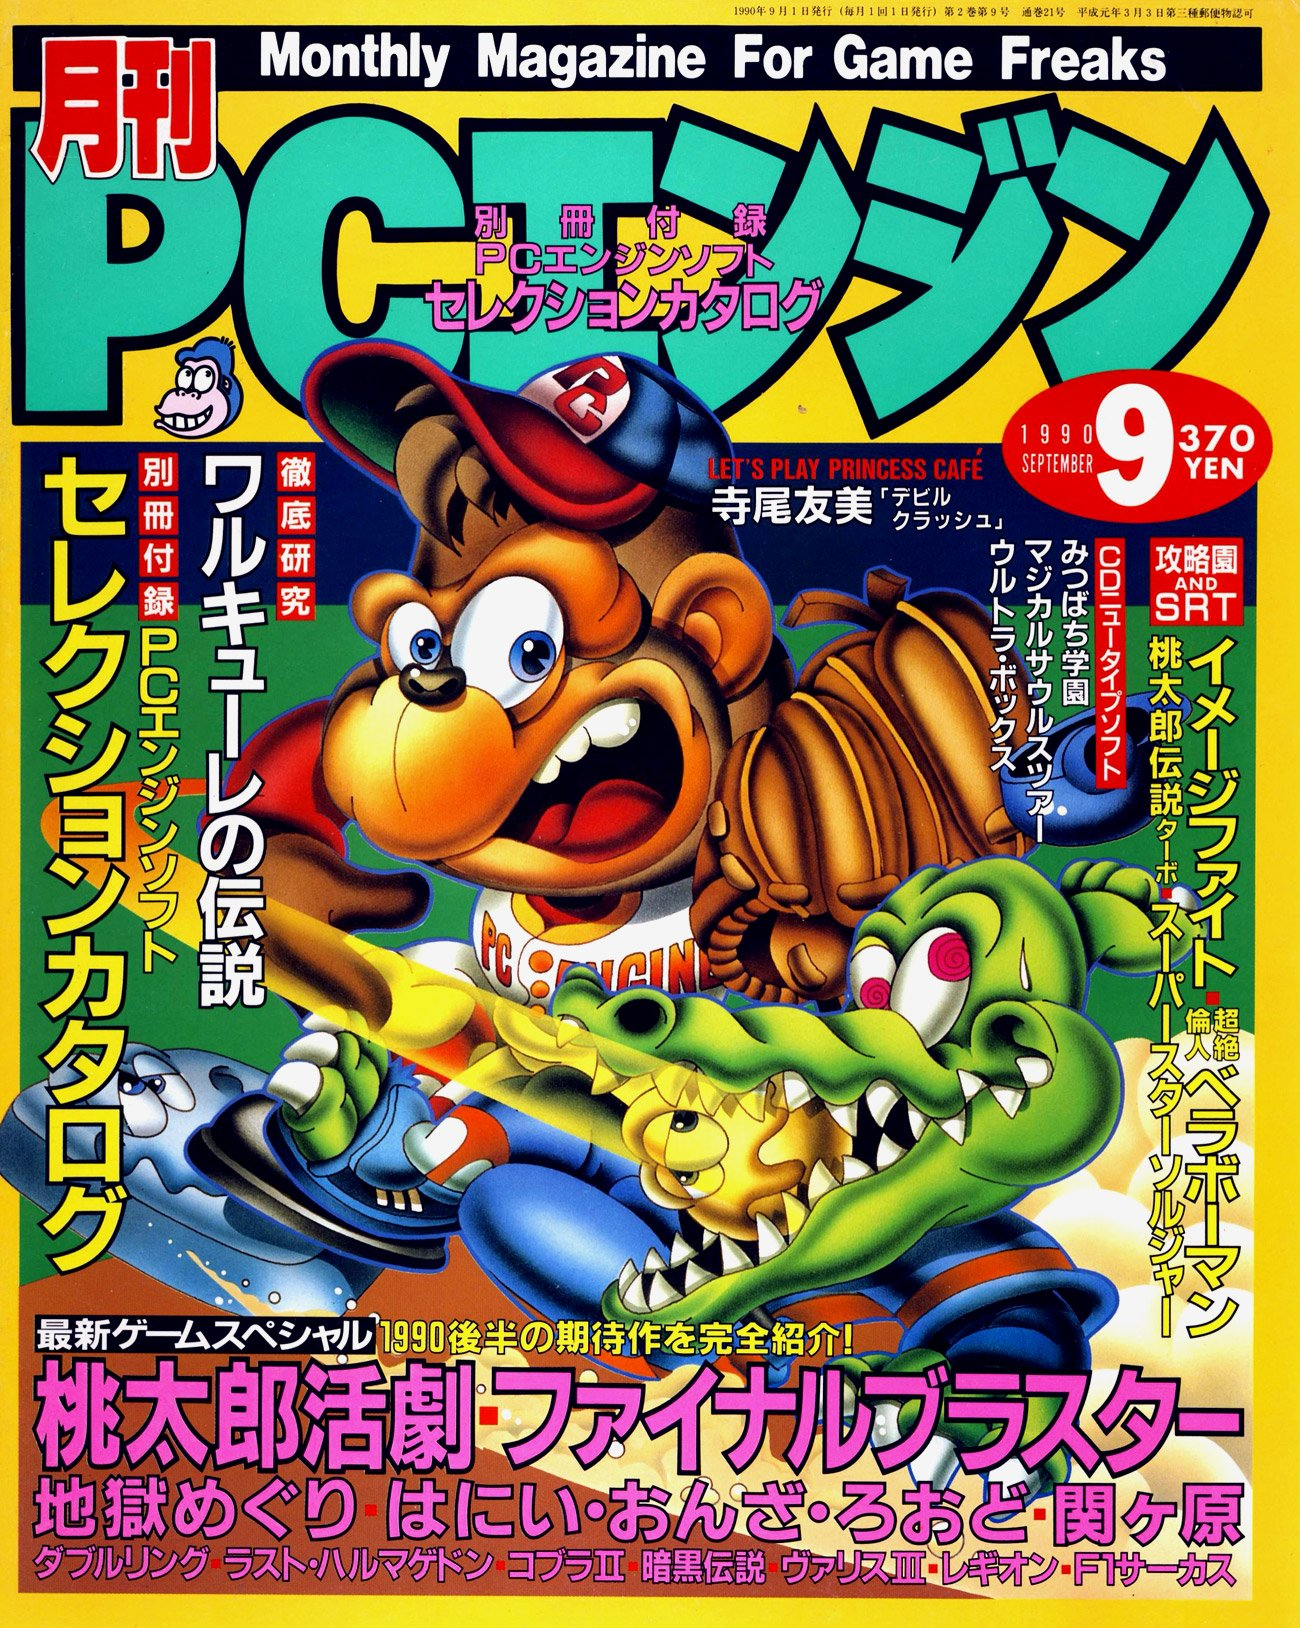 Gekkan PC Engine Issue 21 (September 1990)